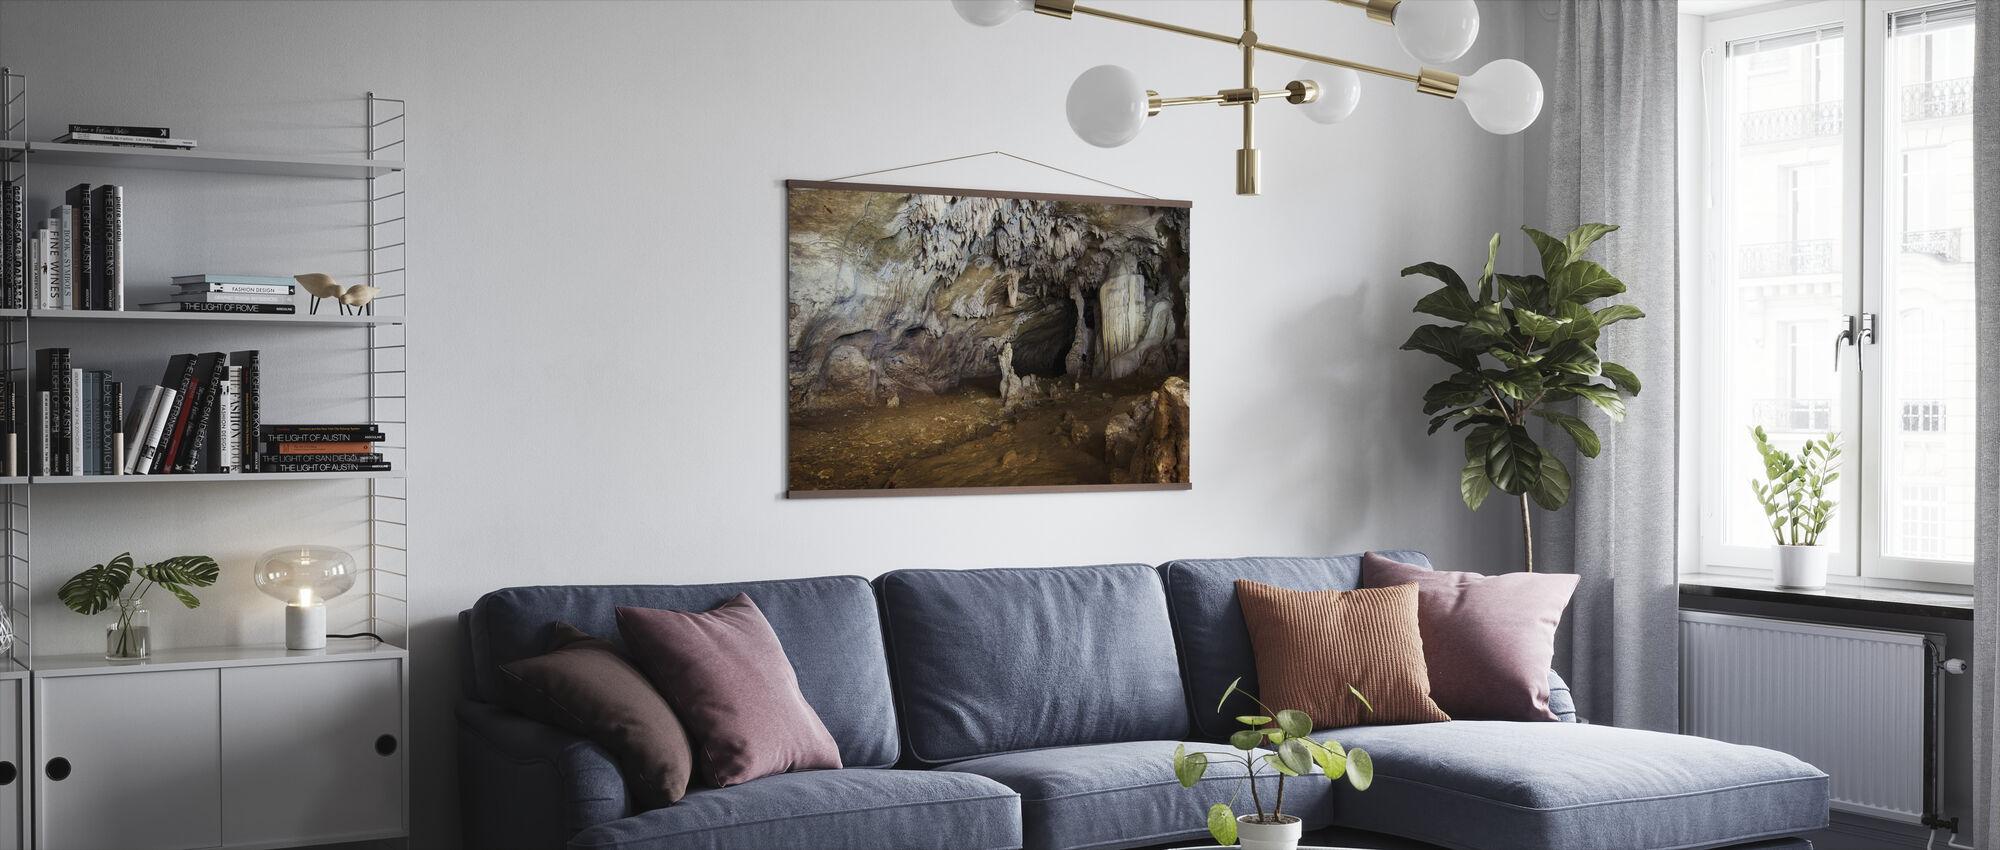 Sohoton-grot - Poster - Woonkamer